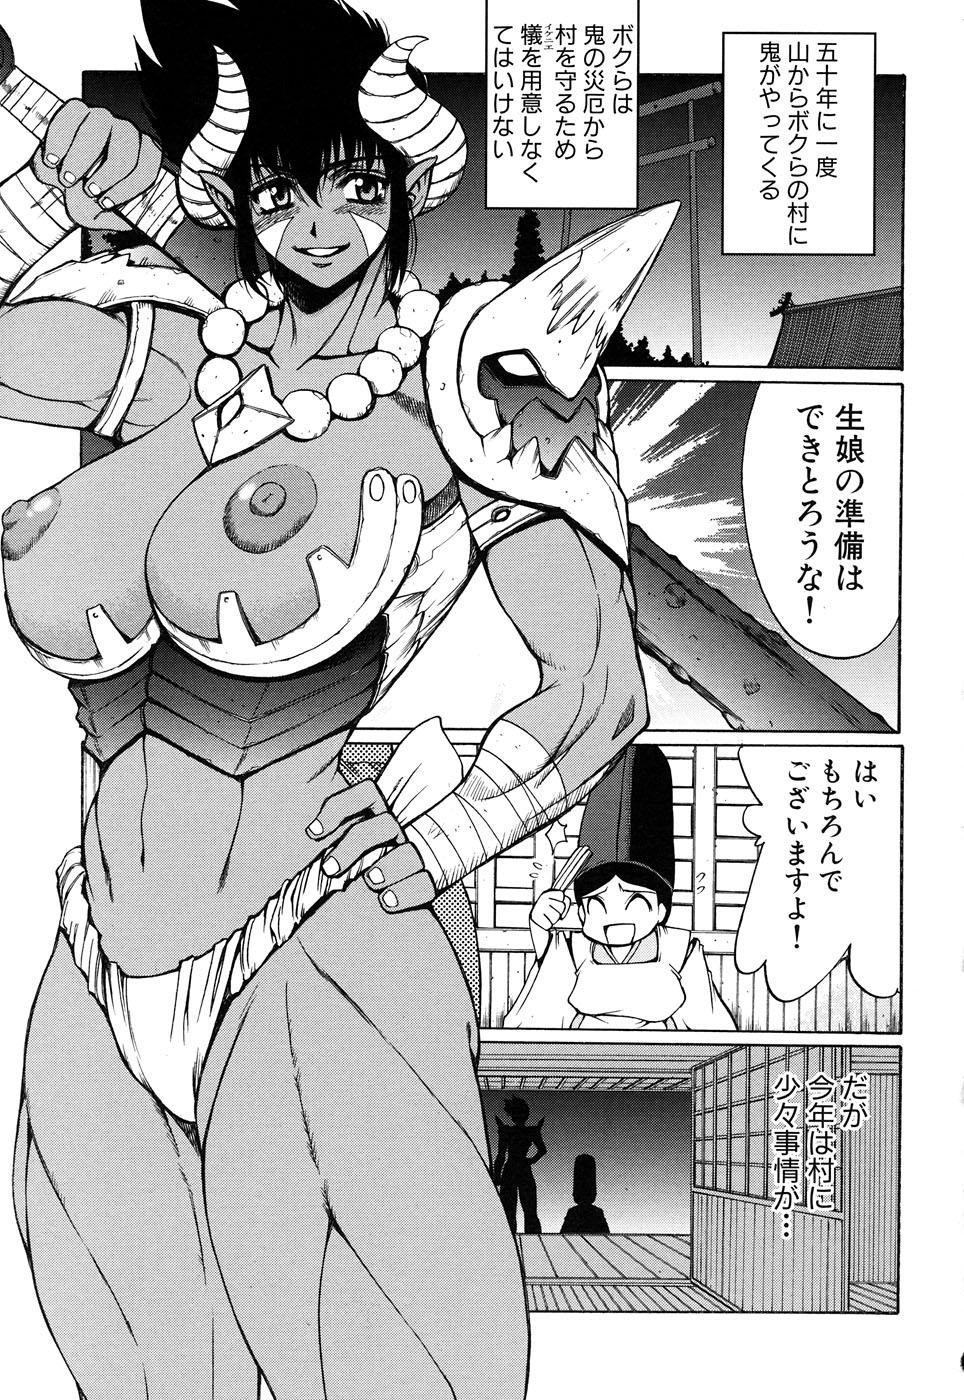 Fechikko VS Series ROUND.2 Miko San VS Maid San 53